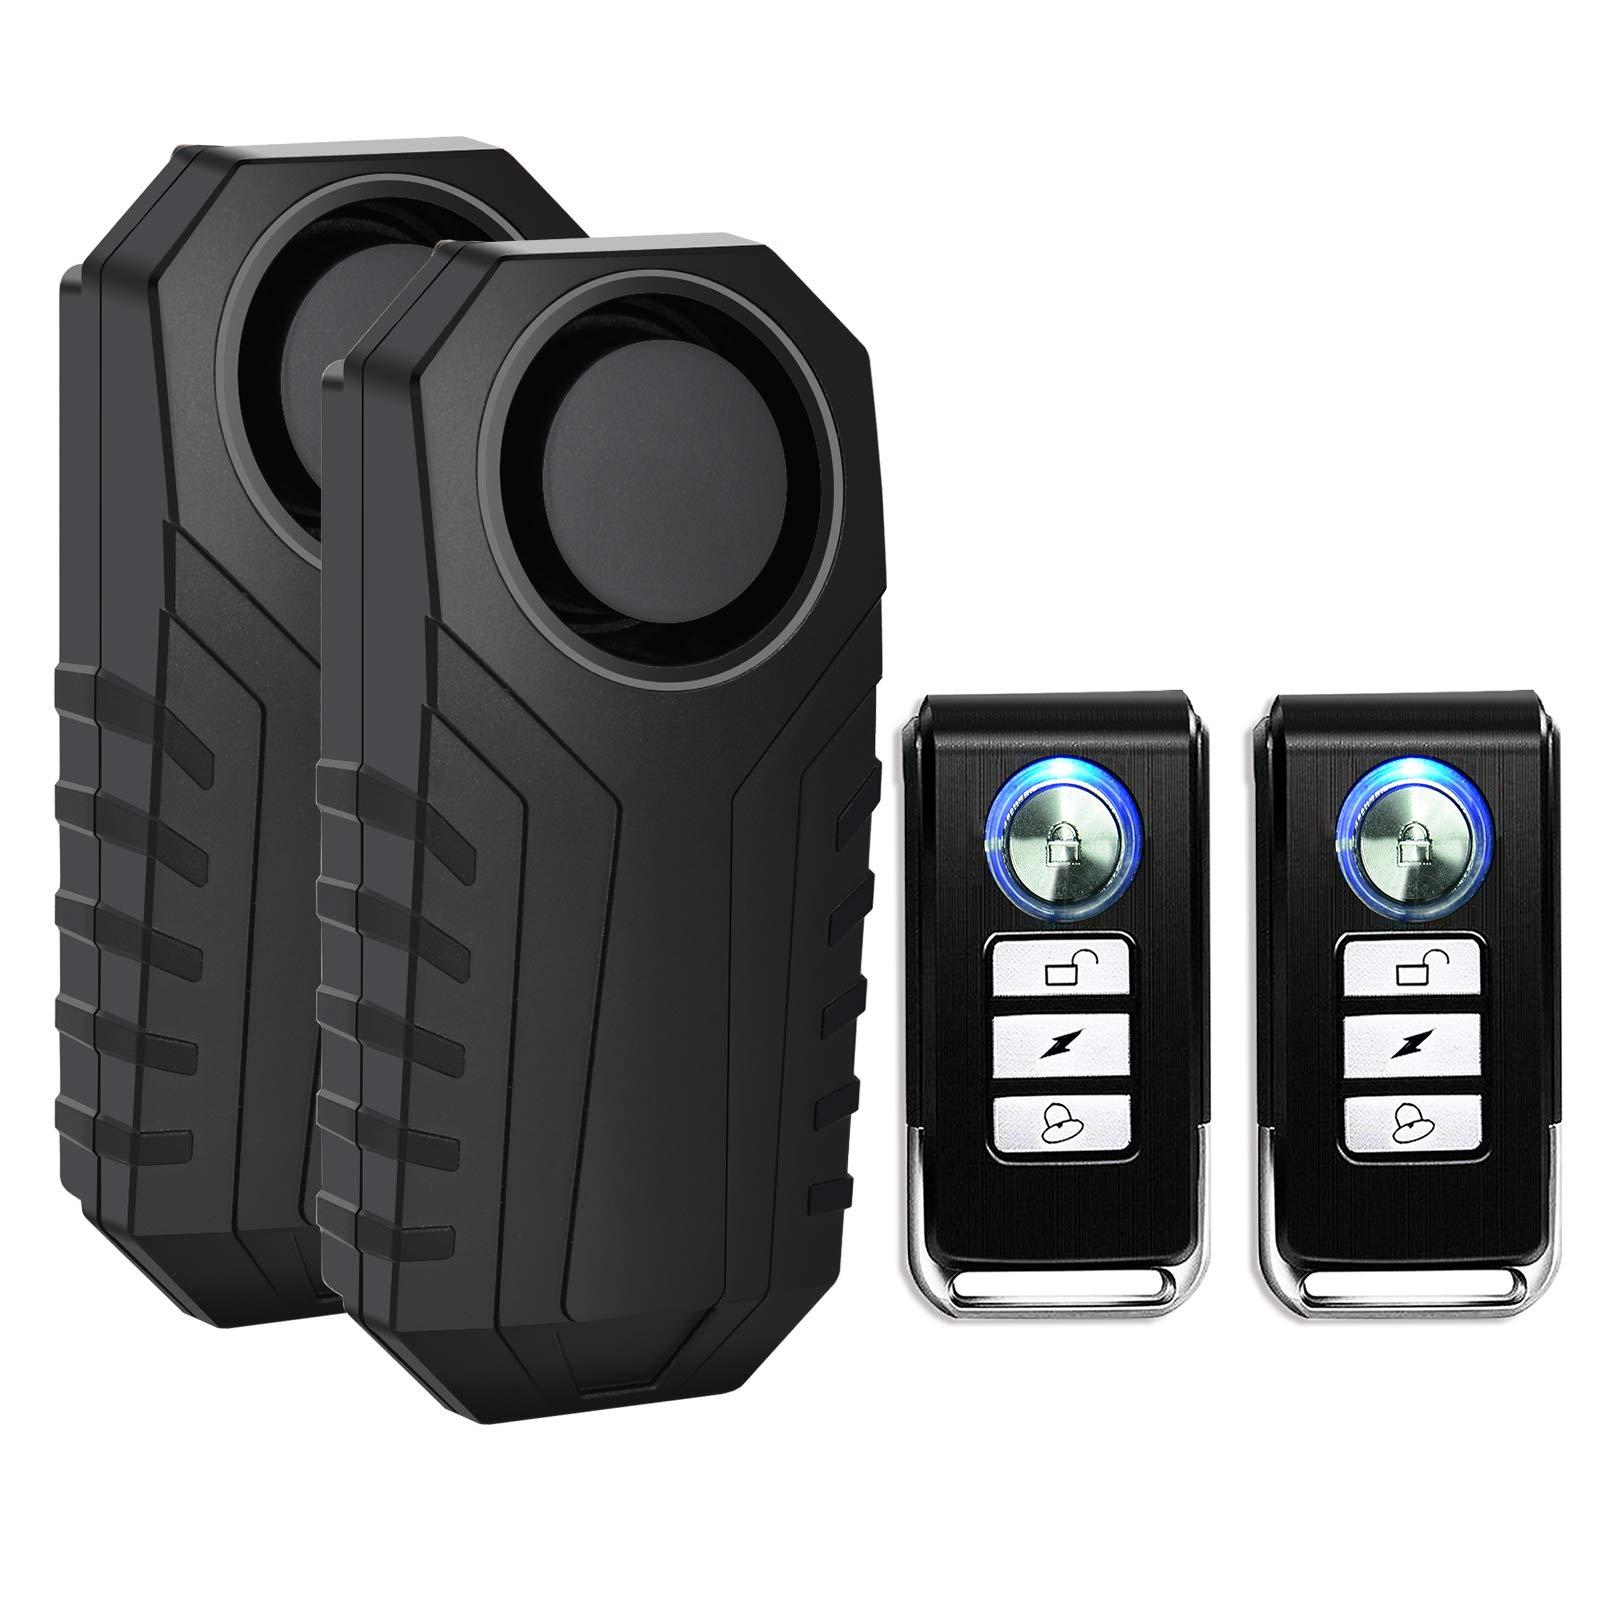 SuperInk 2 Set Wireless Bike Alarm with Remote, Anti-Theft Bicycle Motorcycle Alarm Wireless Security Vibration Motion Sensor Alarm, IP55 Waterproof Super Loud 113dB Alarm